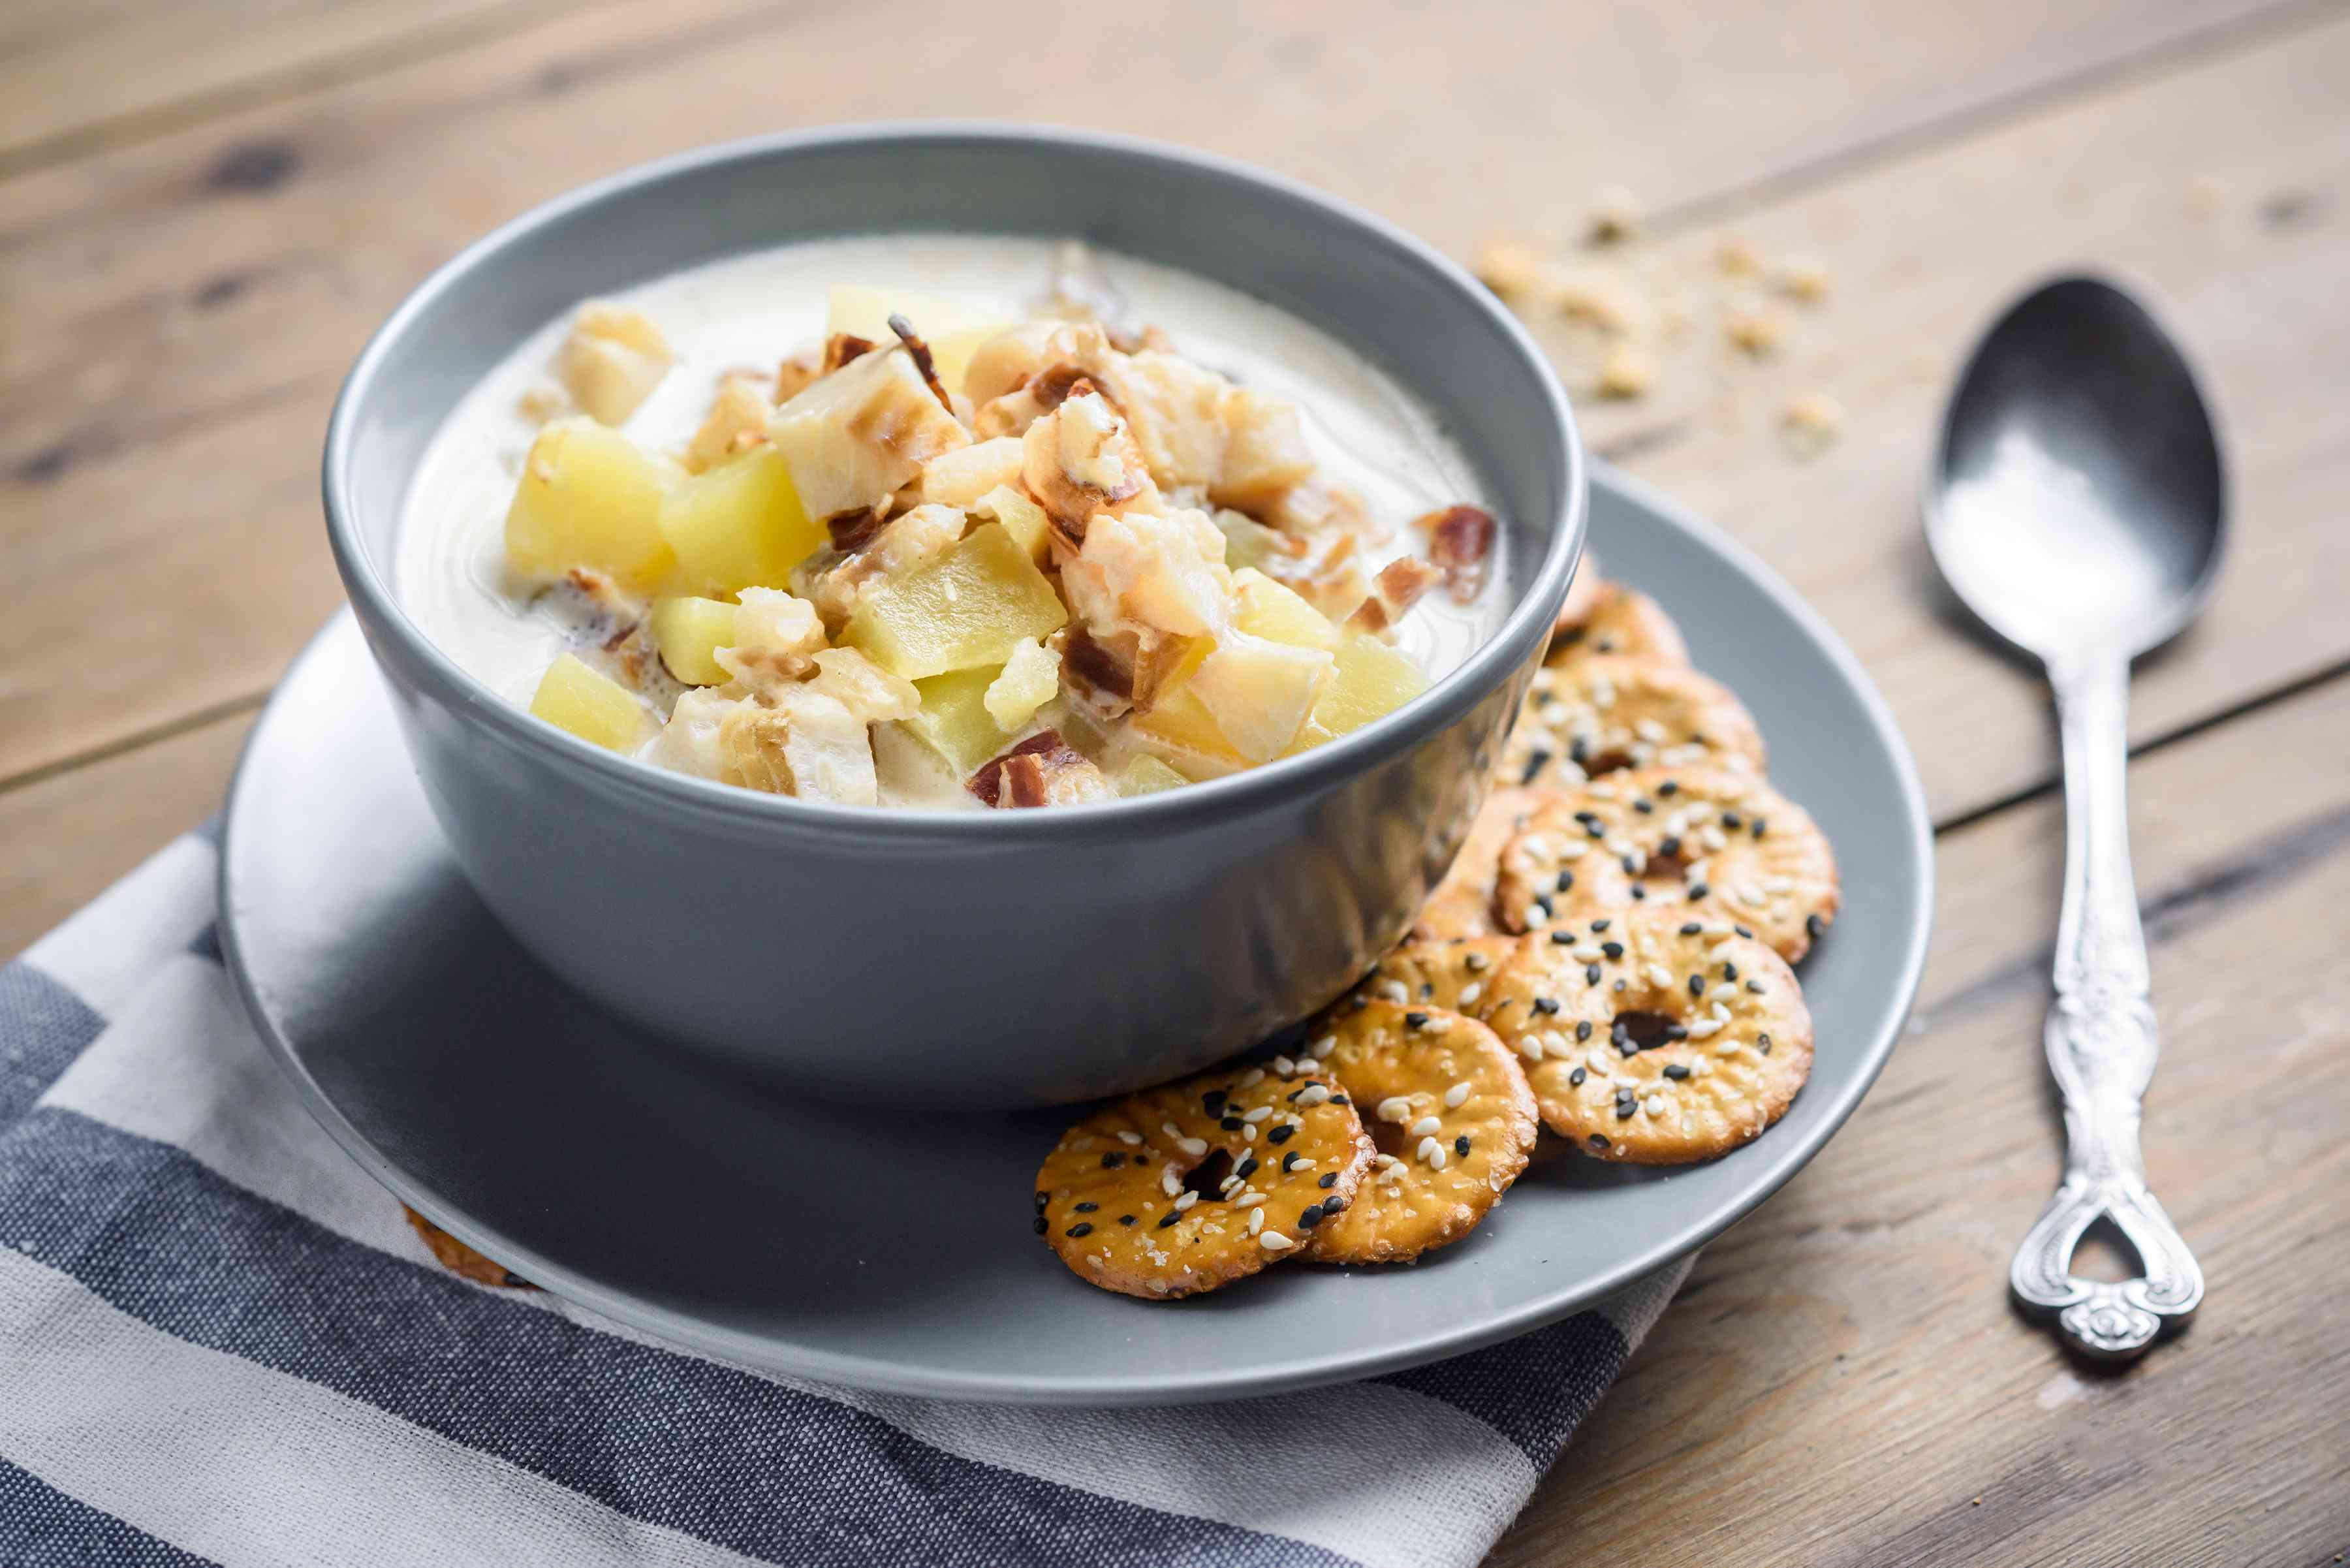 Crock pot fish chowder